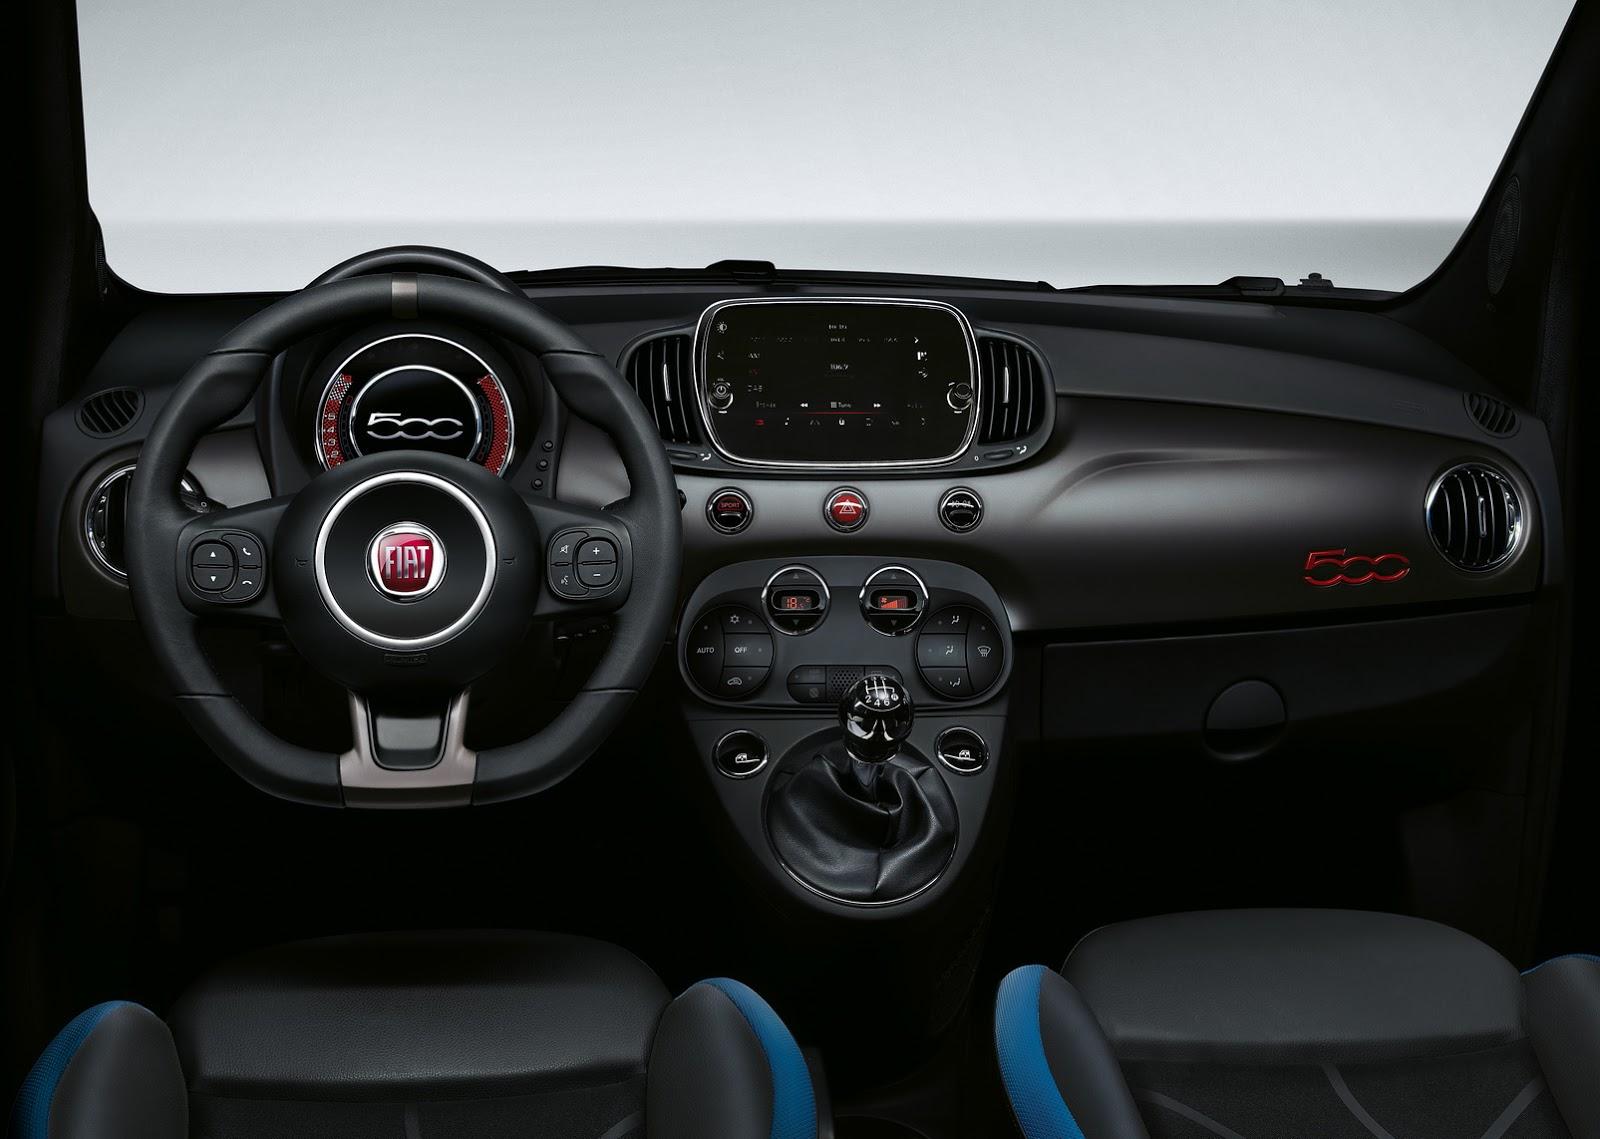 Fiat Sporty 500S ra mắt tại Geneva Motor Show 2016